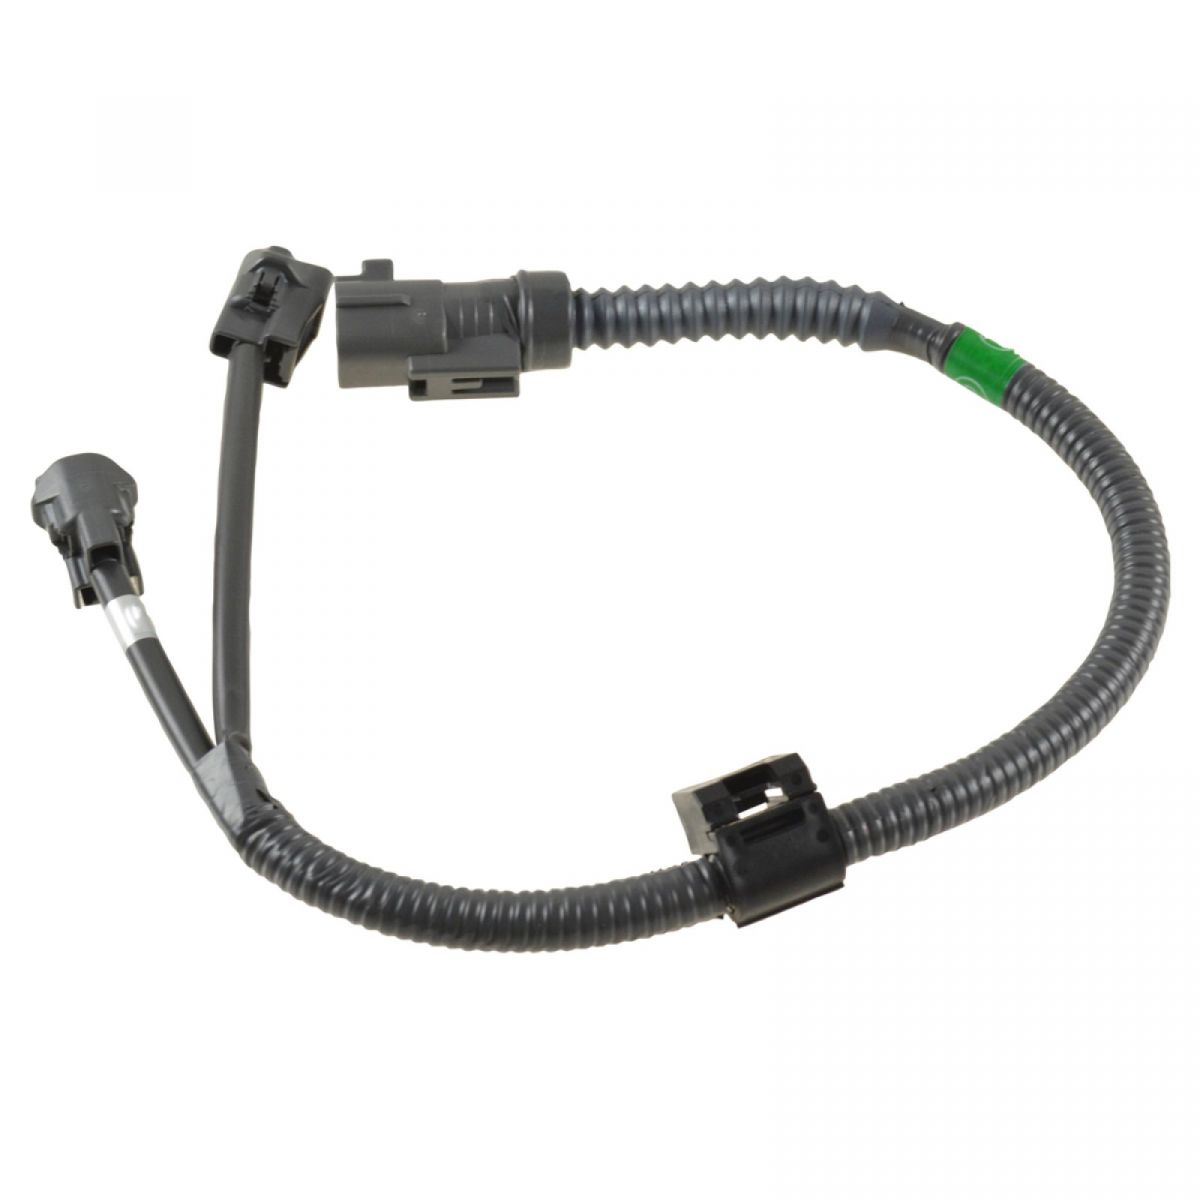 Oem Engine Knock Sensor Wiring Harness Pigtail Plug For 30 Toyota 2004 Silverado Diagram